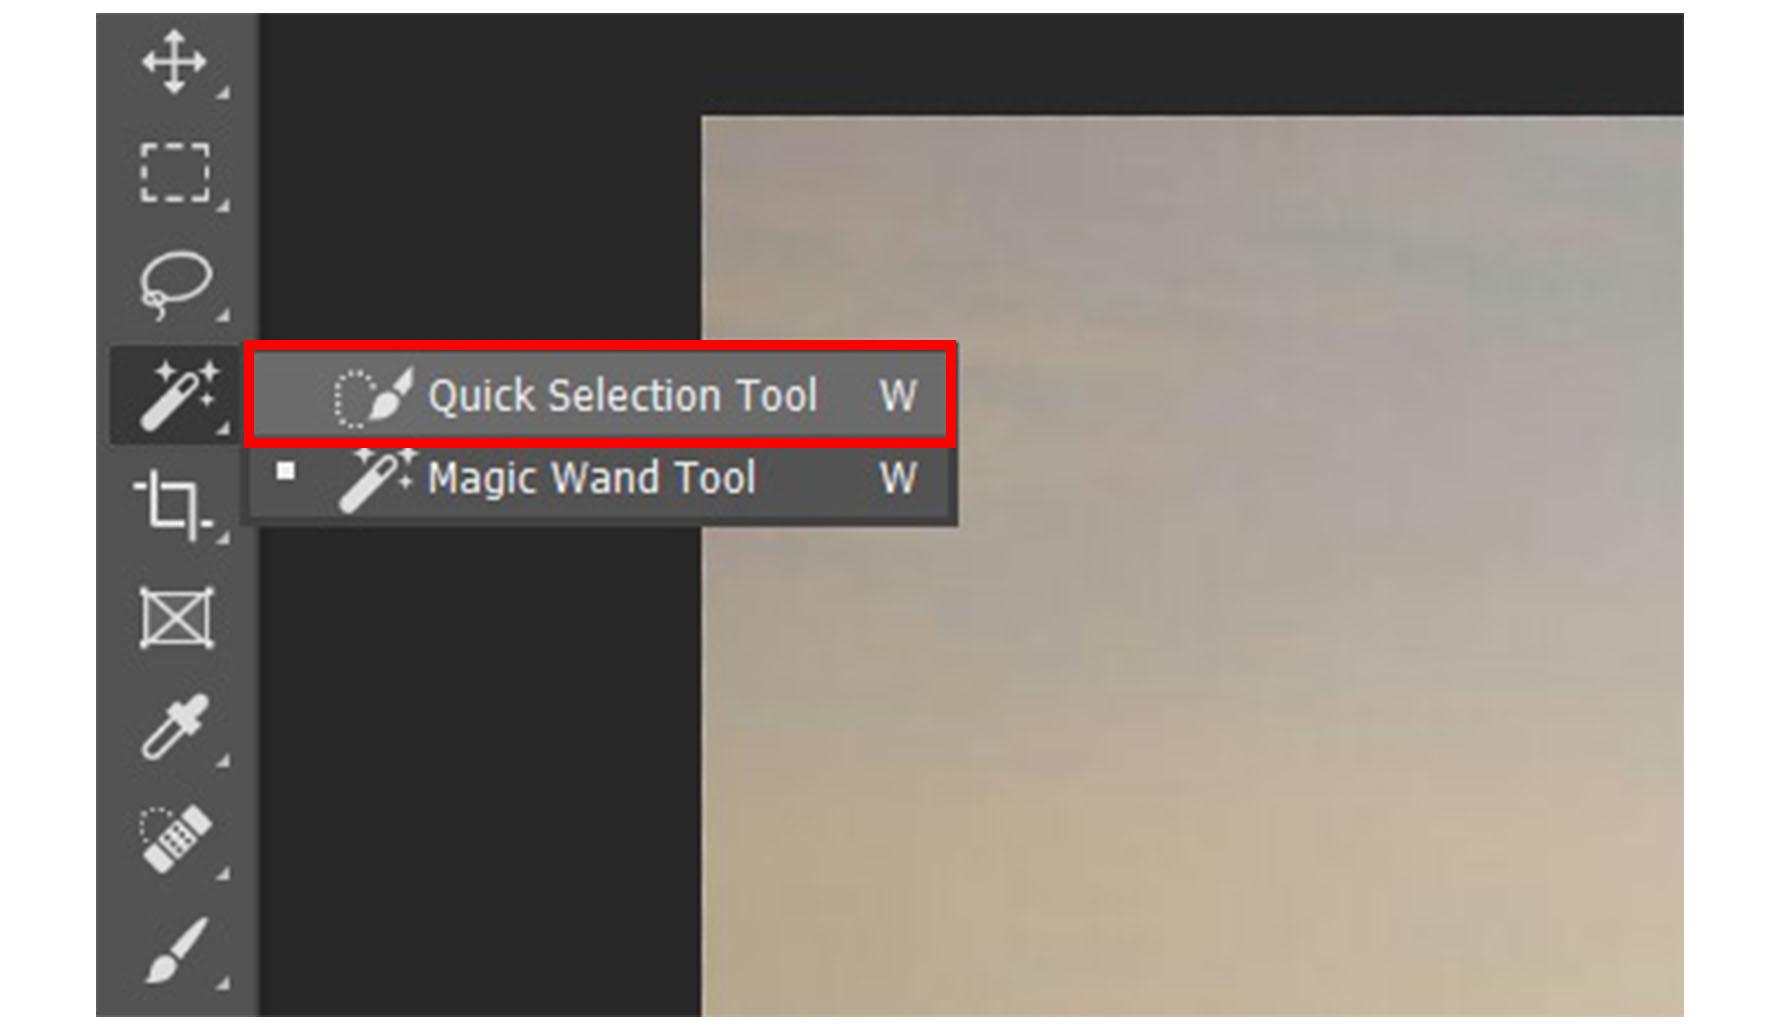 Cara Memotong Gambar di Photoshop Menggunakan Quick Selection Tool